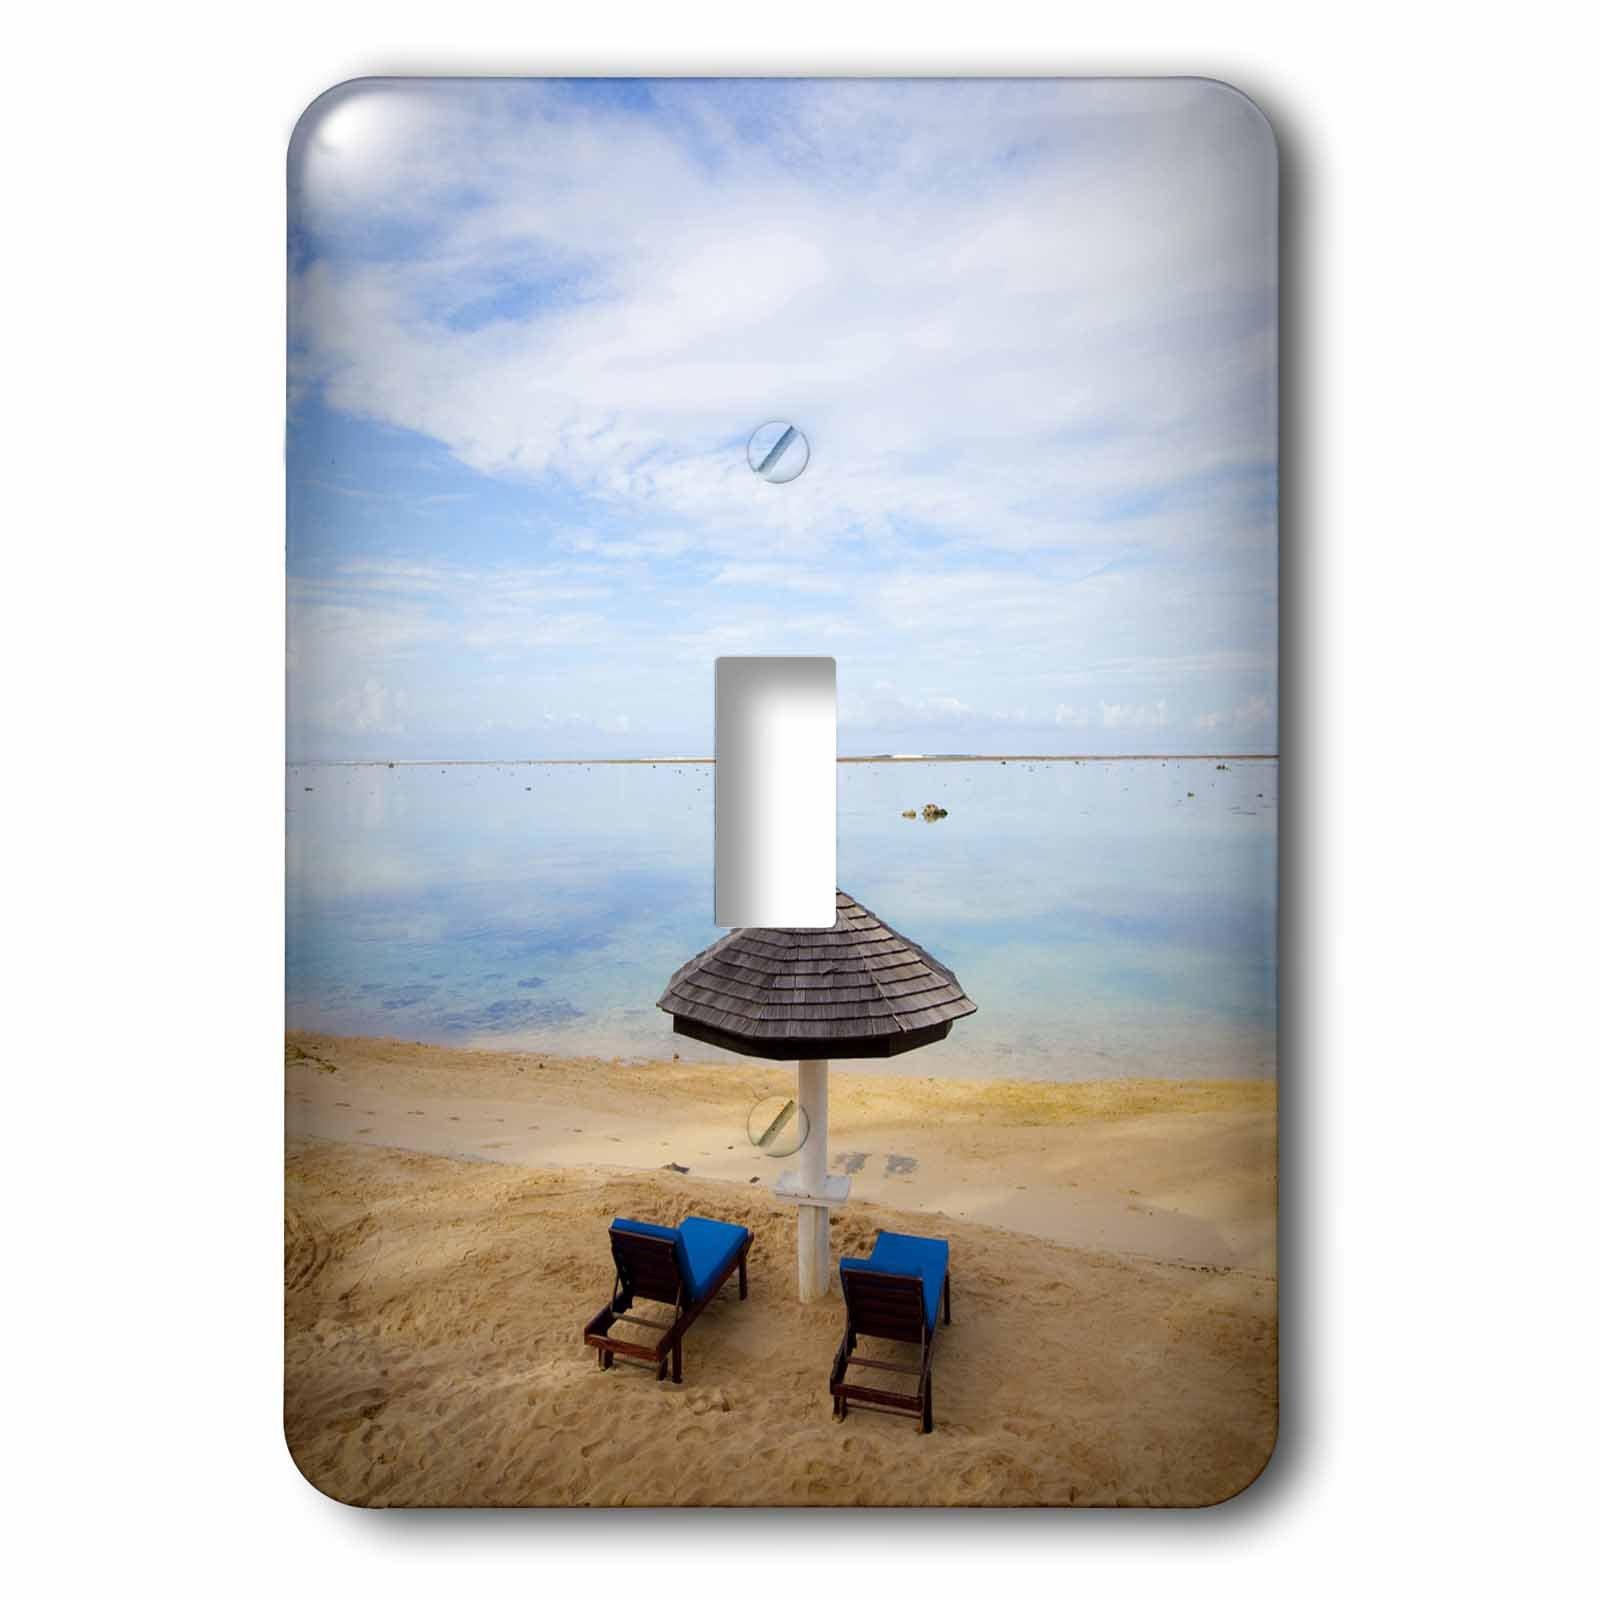 3dRose lsp_84827_1 Warwick Fiji Resort and Spa, Travel, Fiji Oc01 Dpb0248 Douglas Peebles Single Toggle Switch